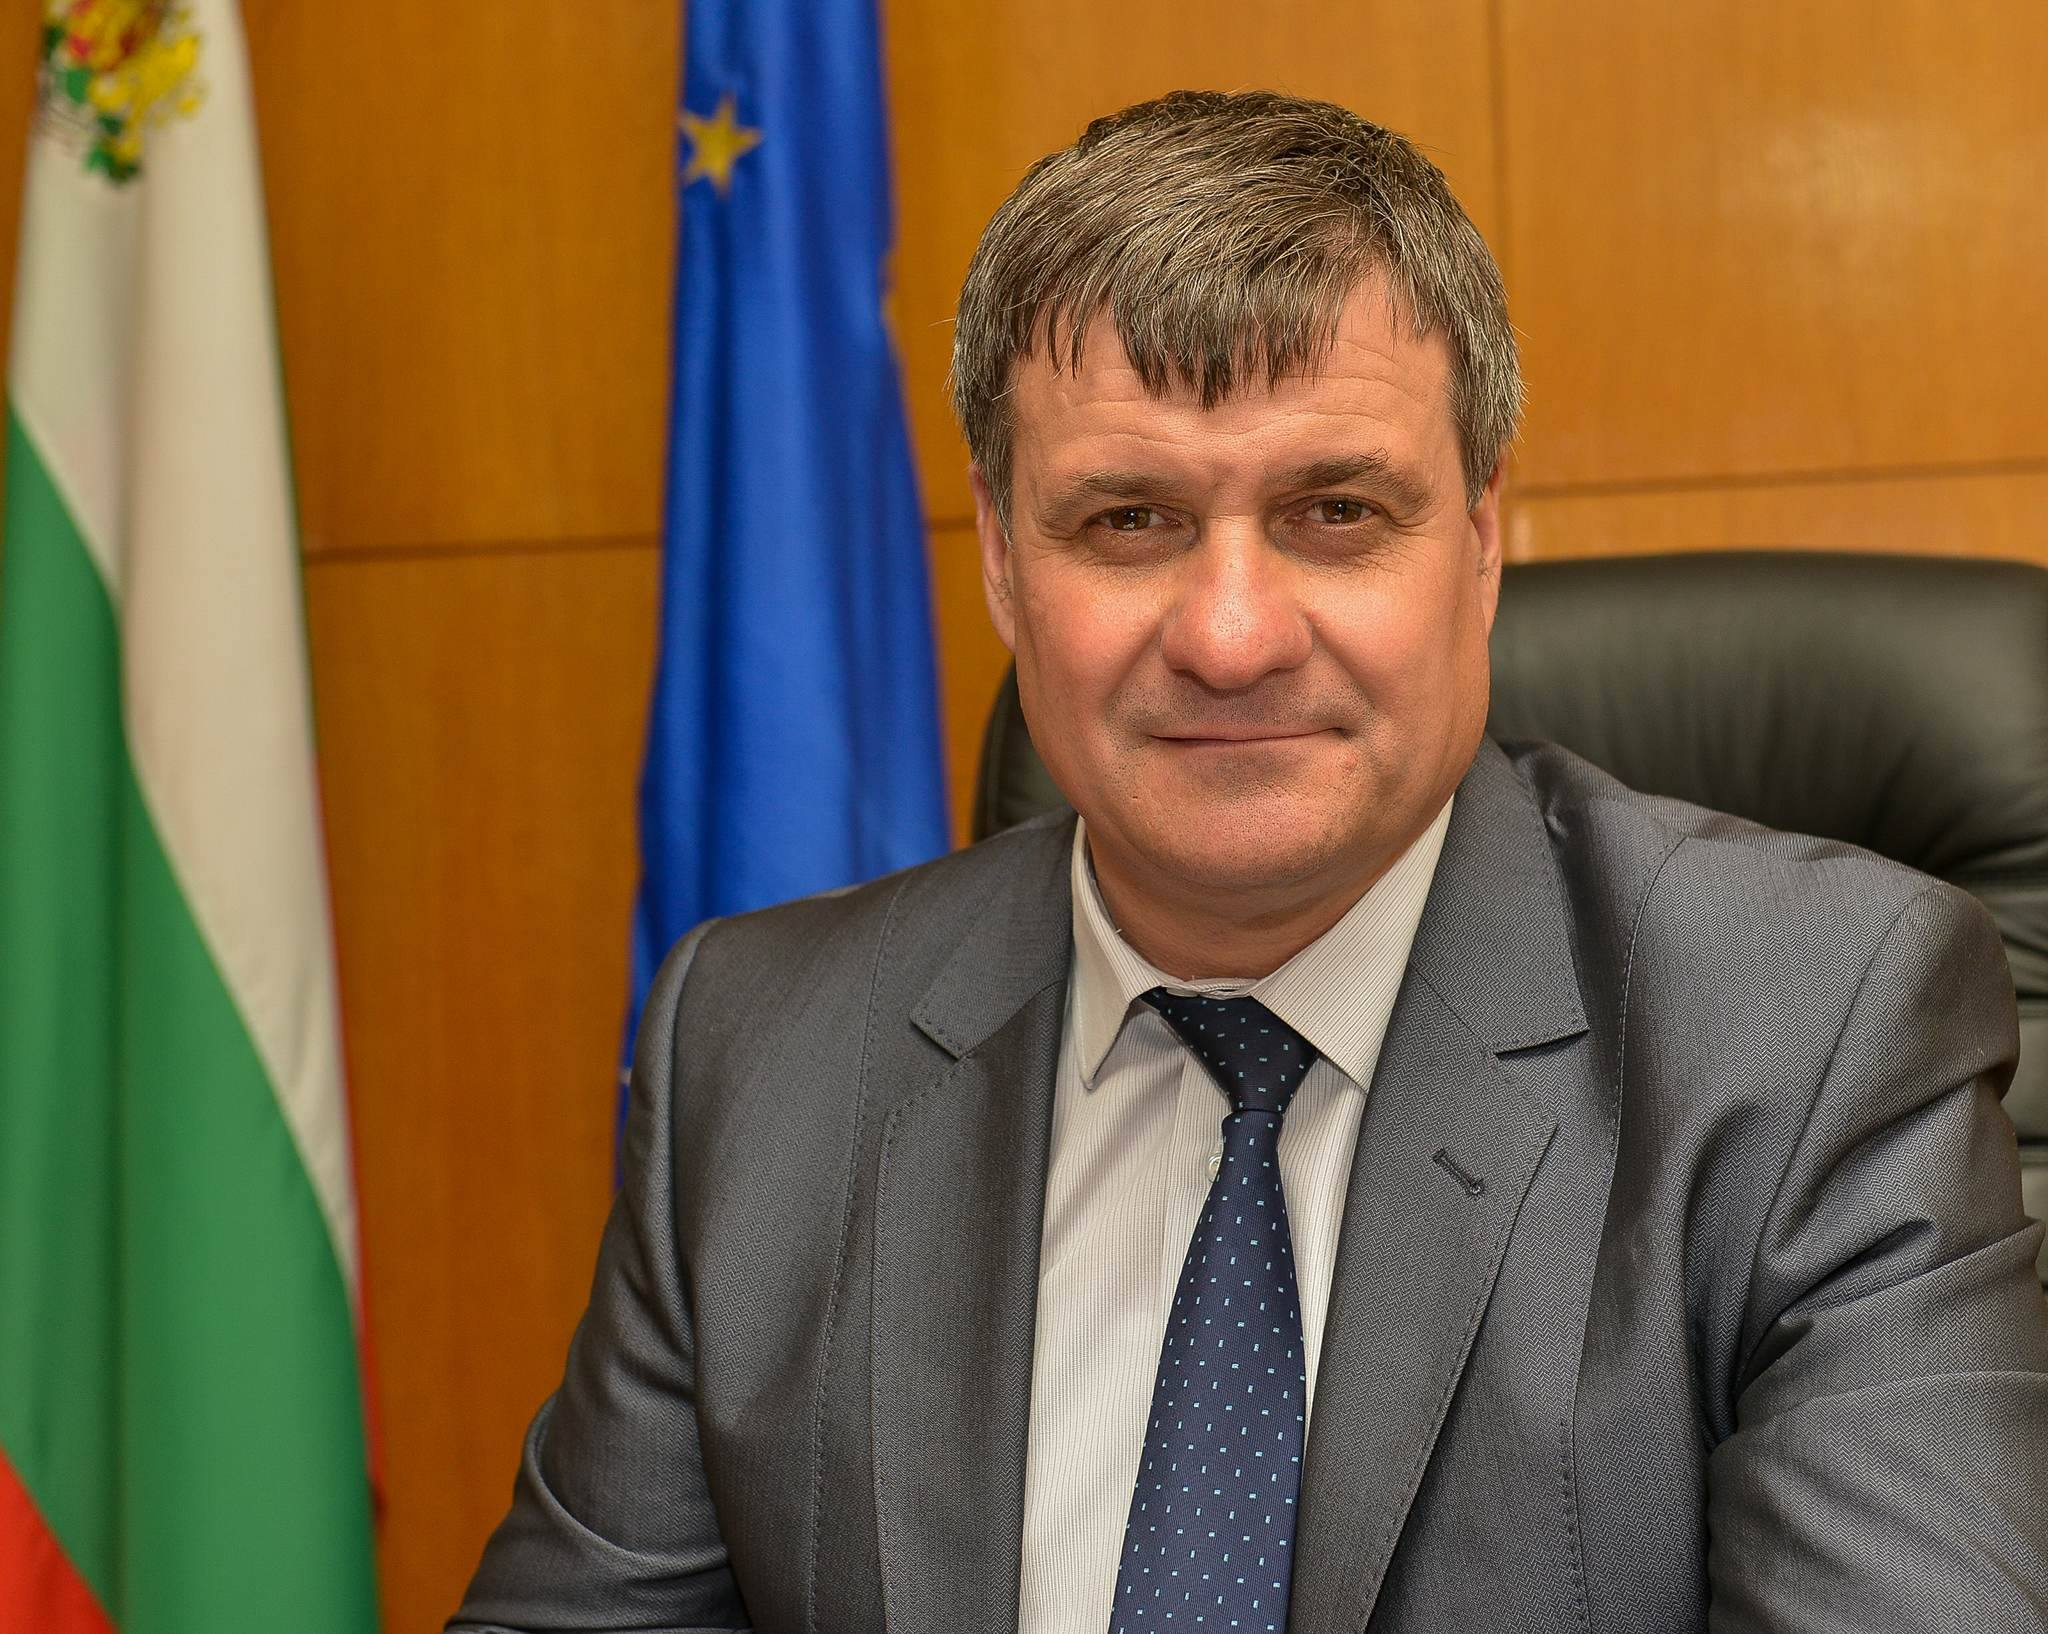 Днес рожден ден празнува д-р Костадин Тодоров Коев